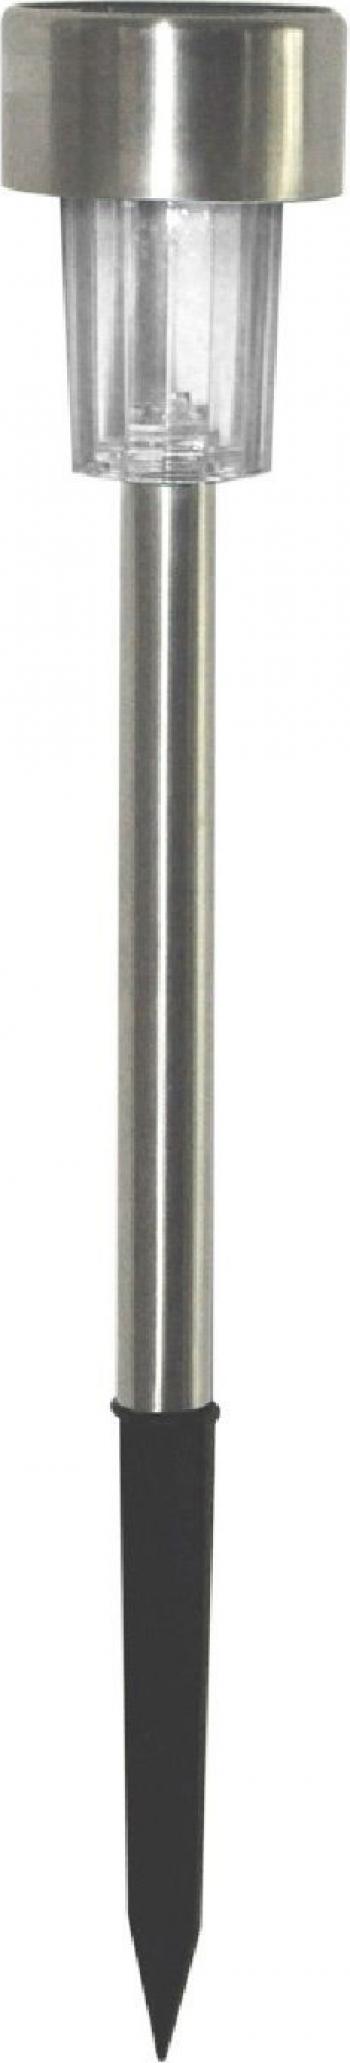 Lampa Solara LED din Metal Argintiu Inaltime 30cm Corpuri de iluminat